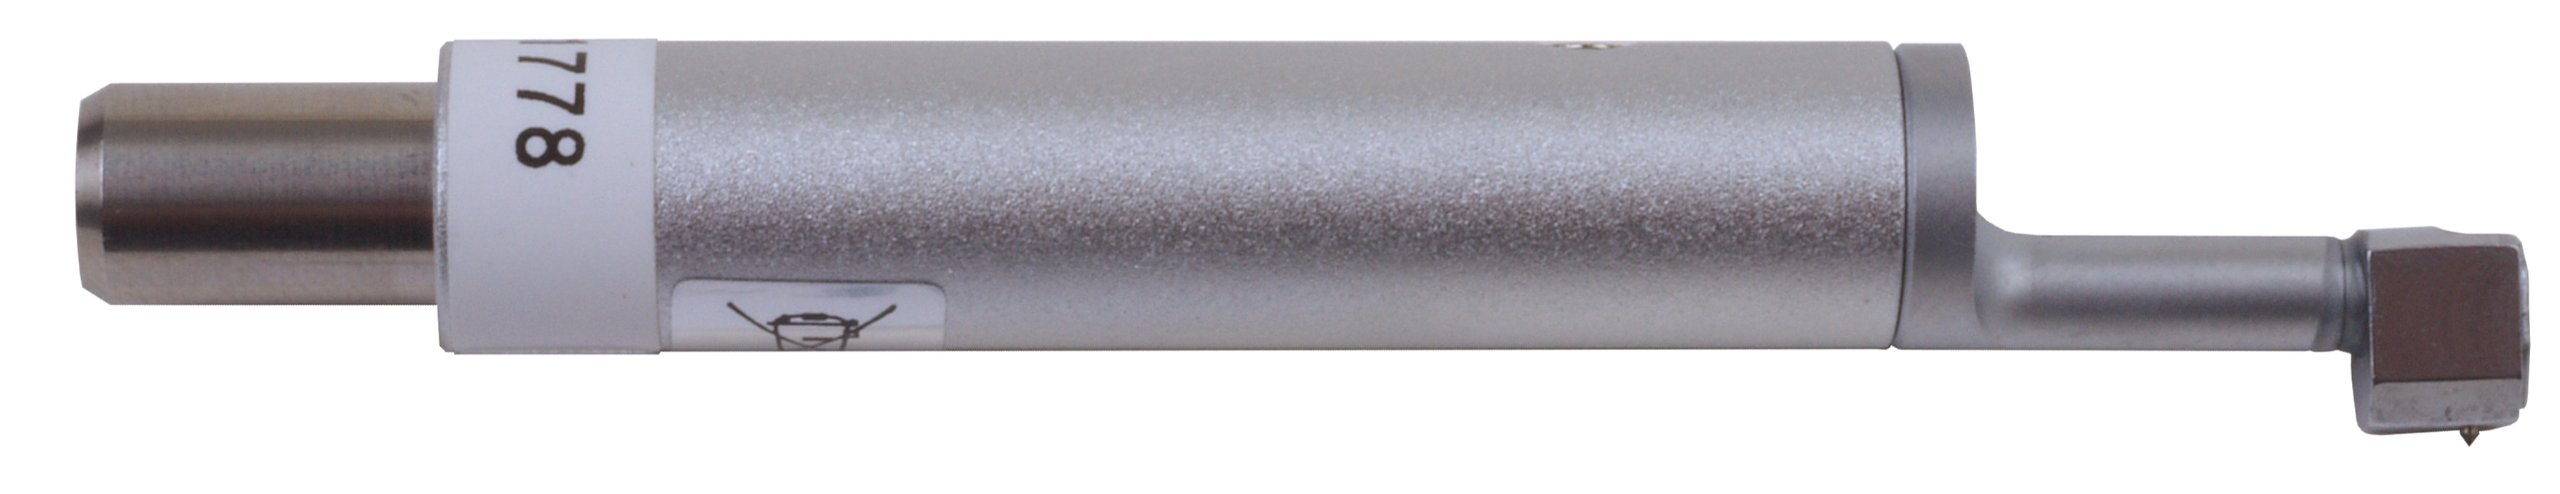 Mitutoyo Standard Detector for SJ210 (4mN Type)